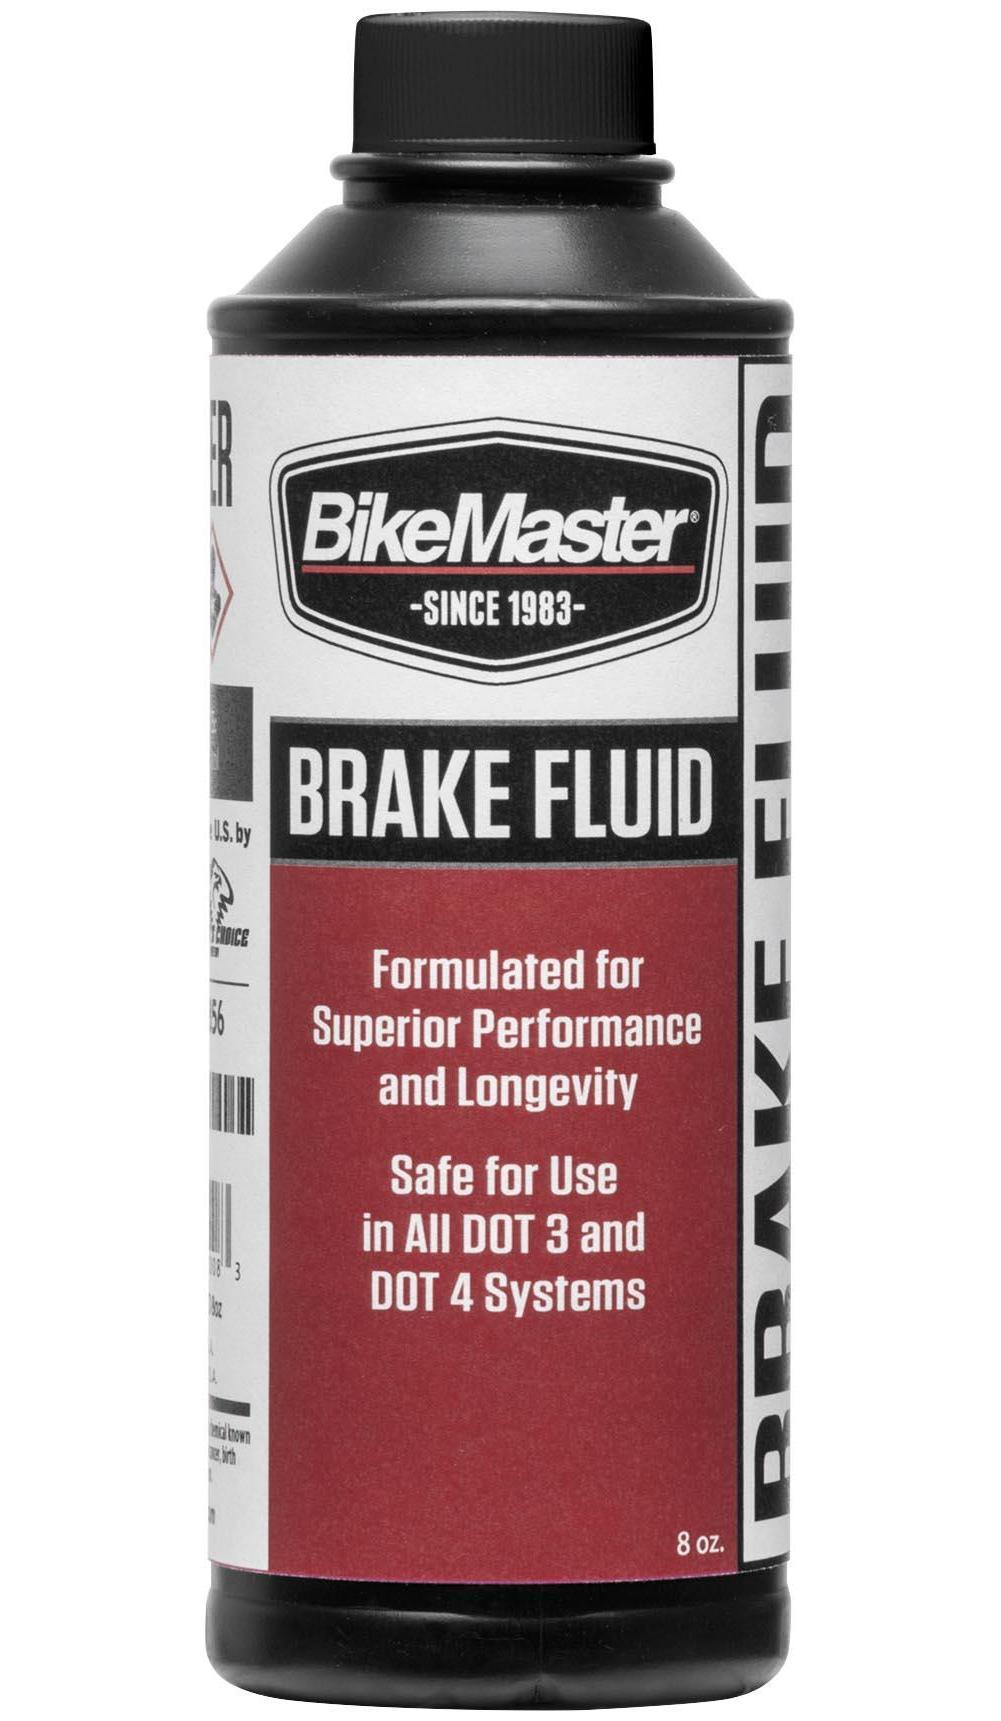 BikeMaster 531857 DOT 4 Brake Fluid 8oz. by BikeMaster